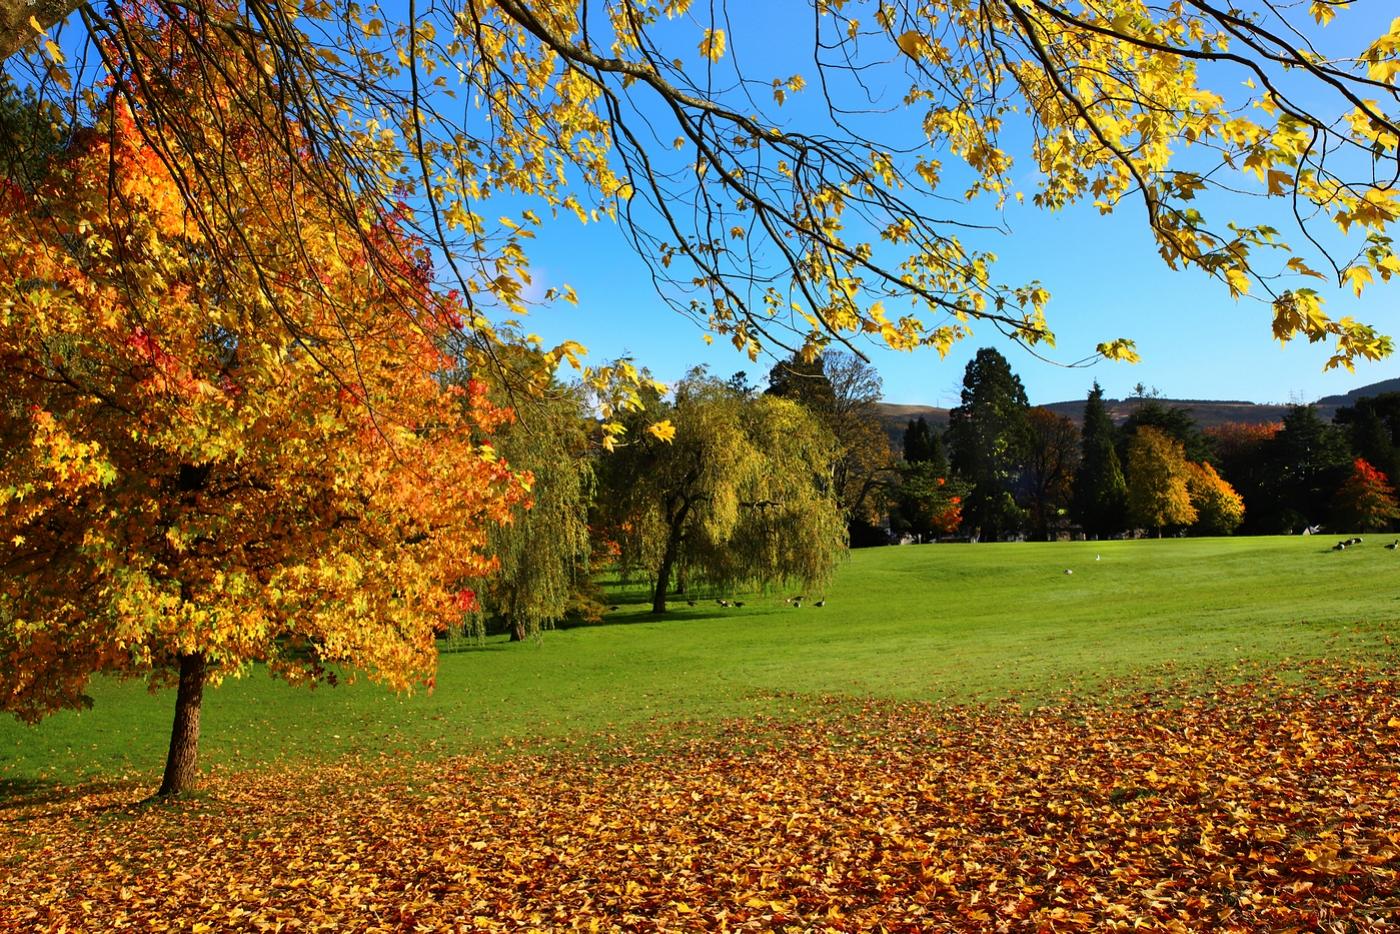 autumn-trees-by-wendy-donovan